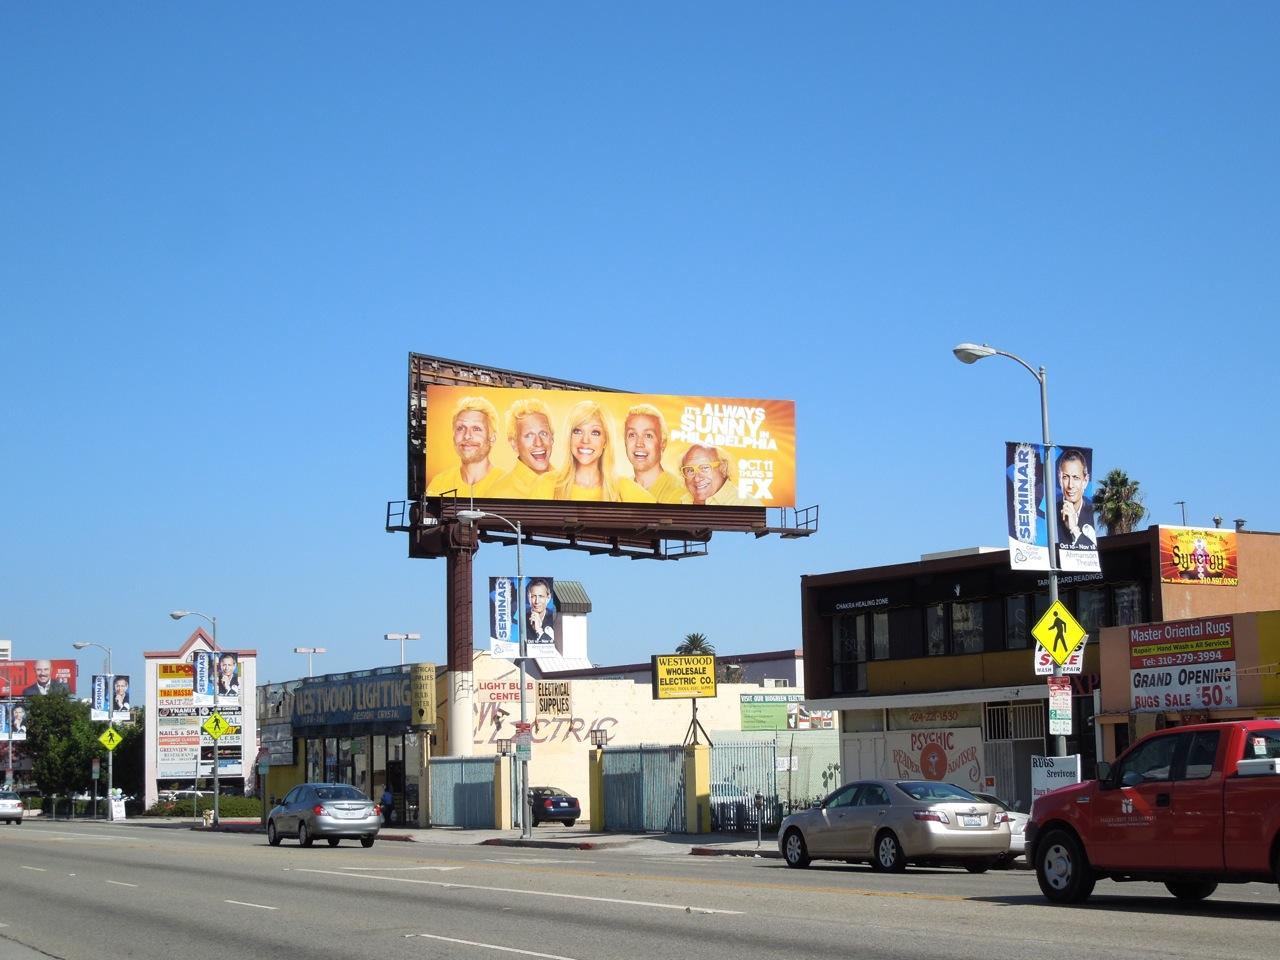 http://2.bp.blogspot.com/-wfcHIykYzJo/UHSZ_VernZI/AAAAAAAA2Eo/CcDEI0Yi59Y/s1600/sunny+philadelphia+8+billboard.jpg